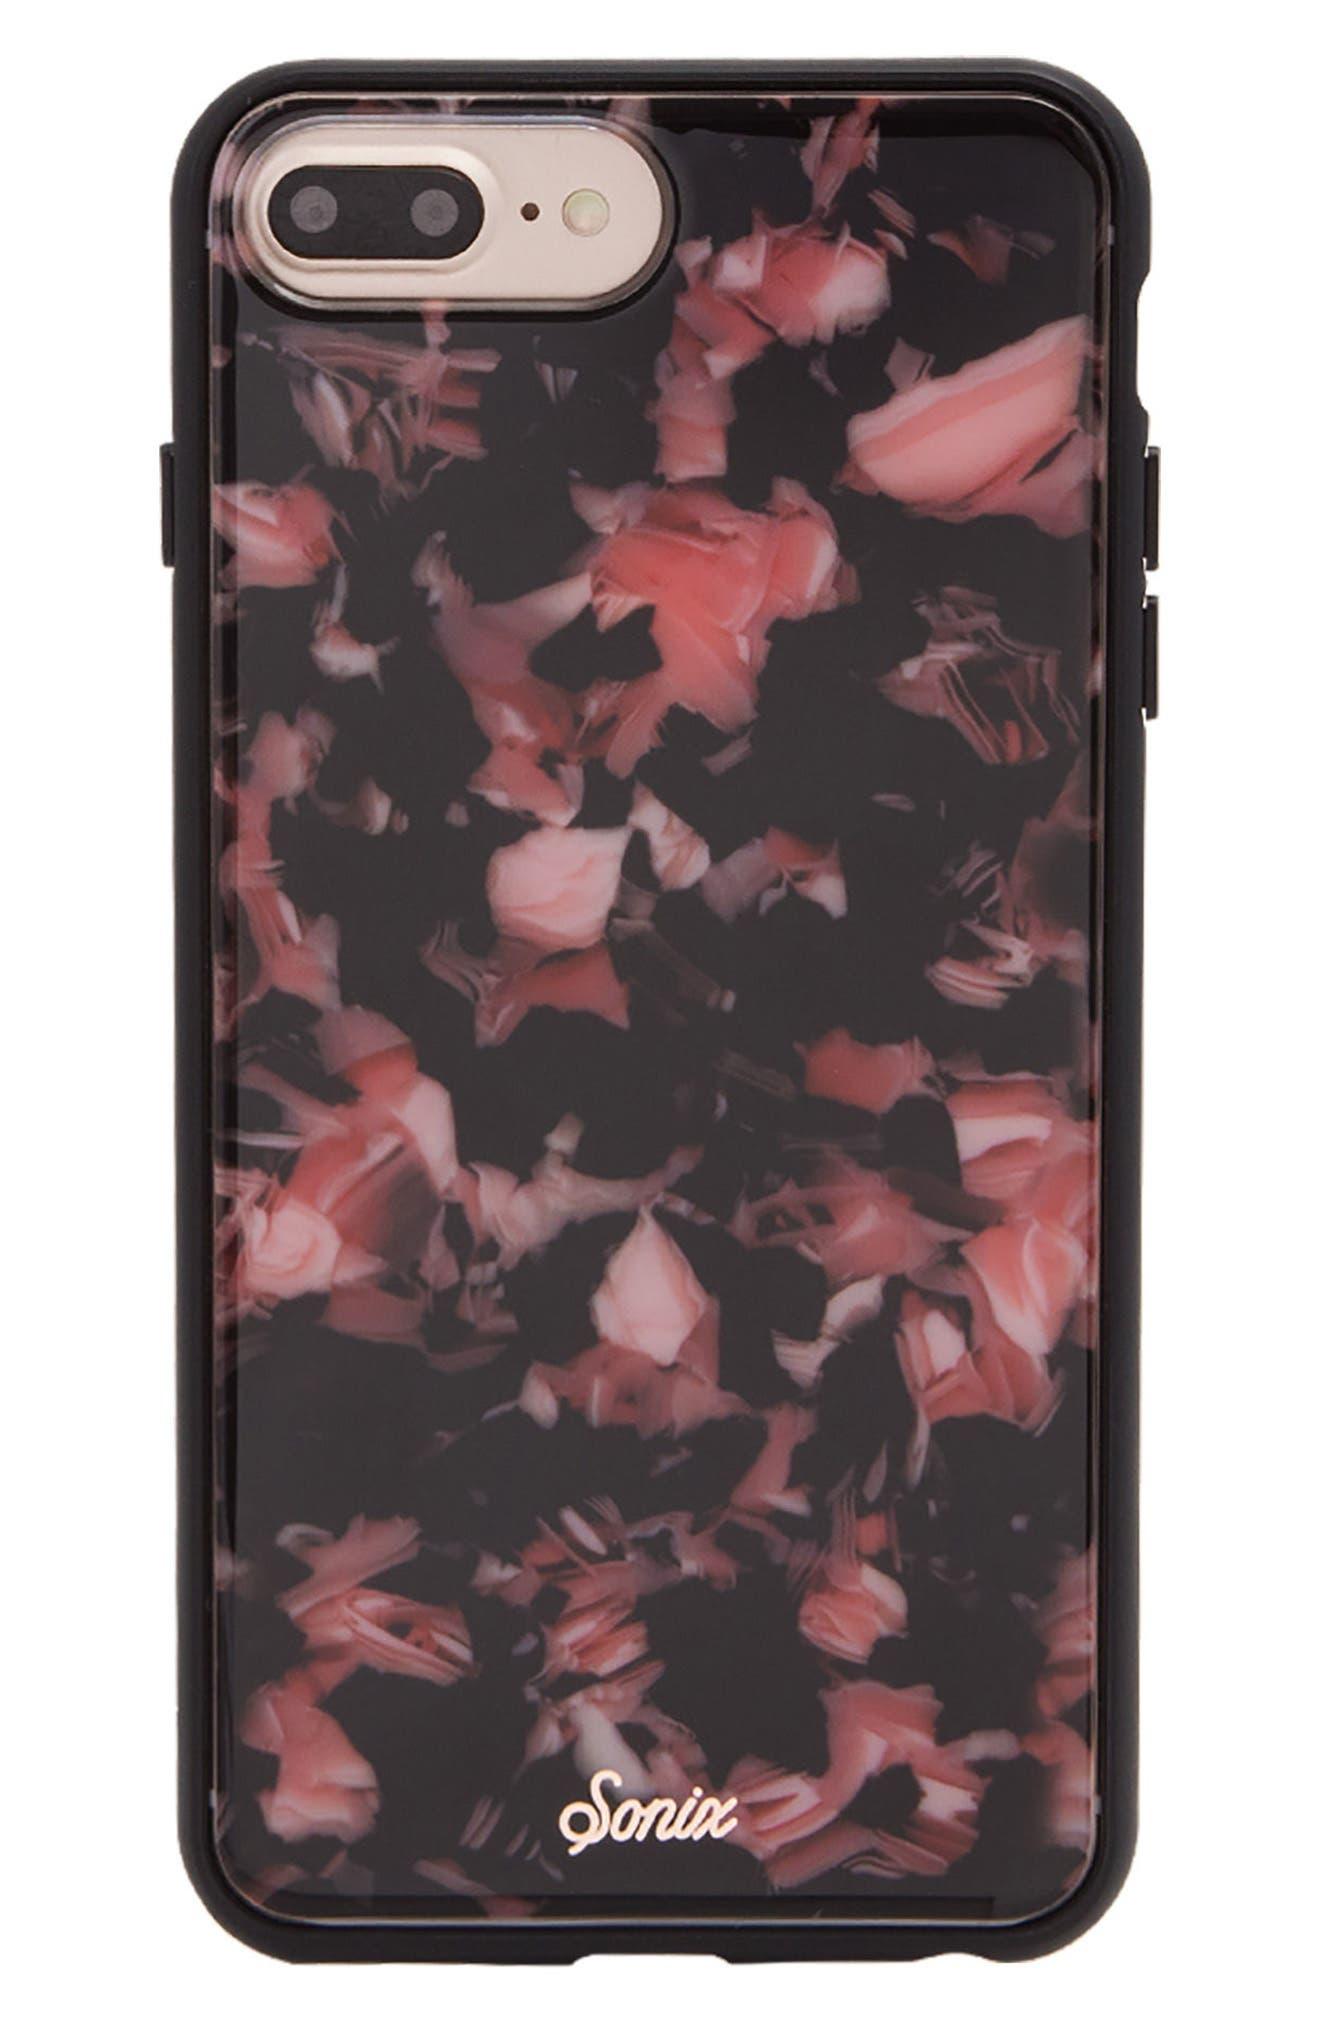 Sonix Tortoise Print iPhone 6/6s/7/8 & 6/6s/7/8 Plus Case